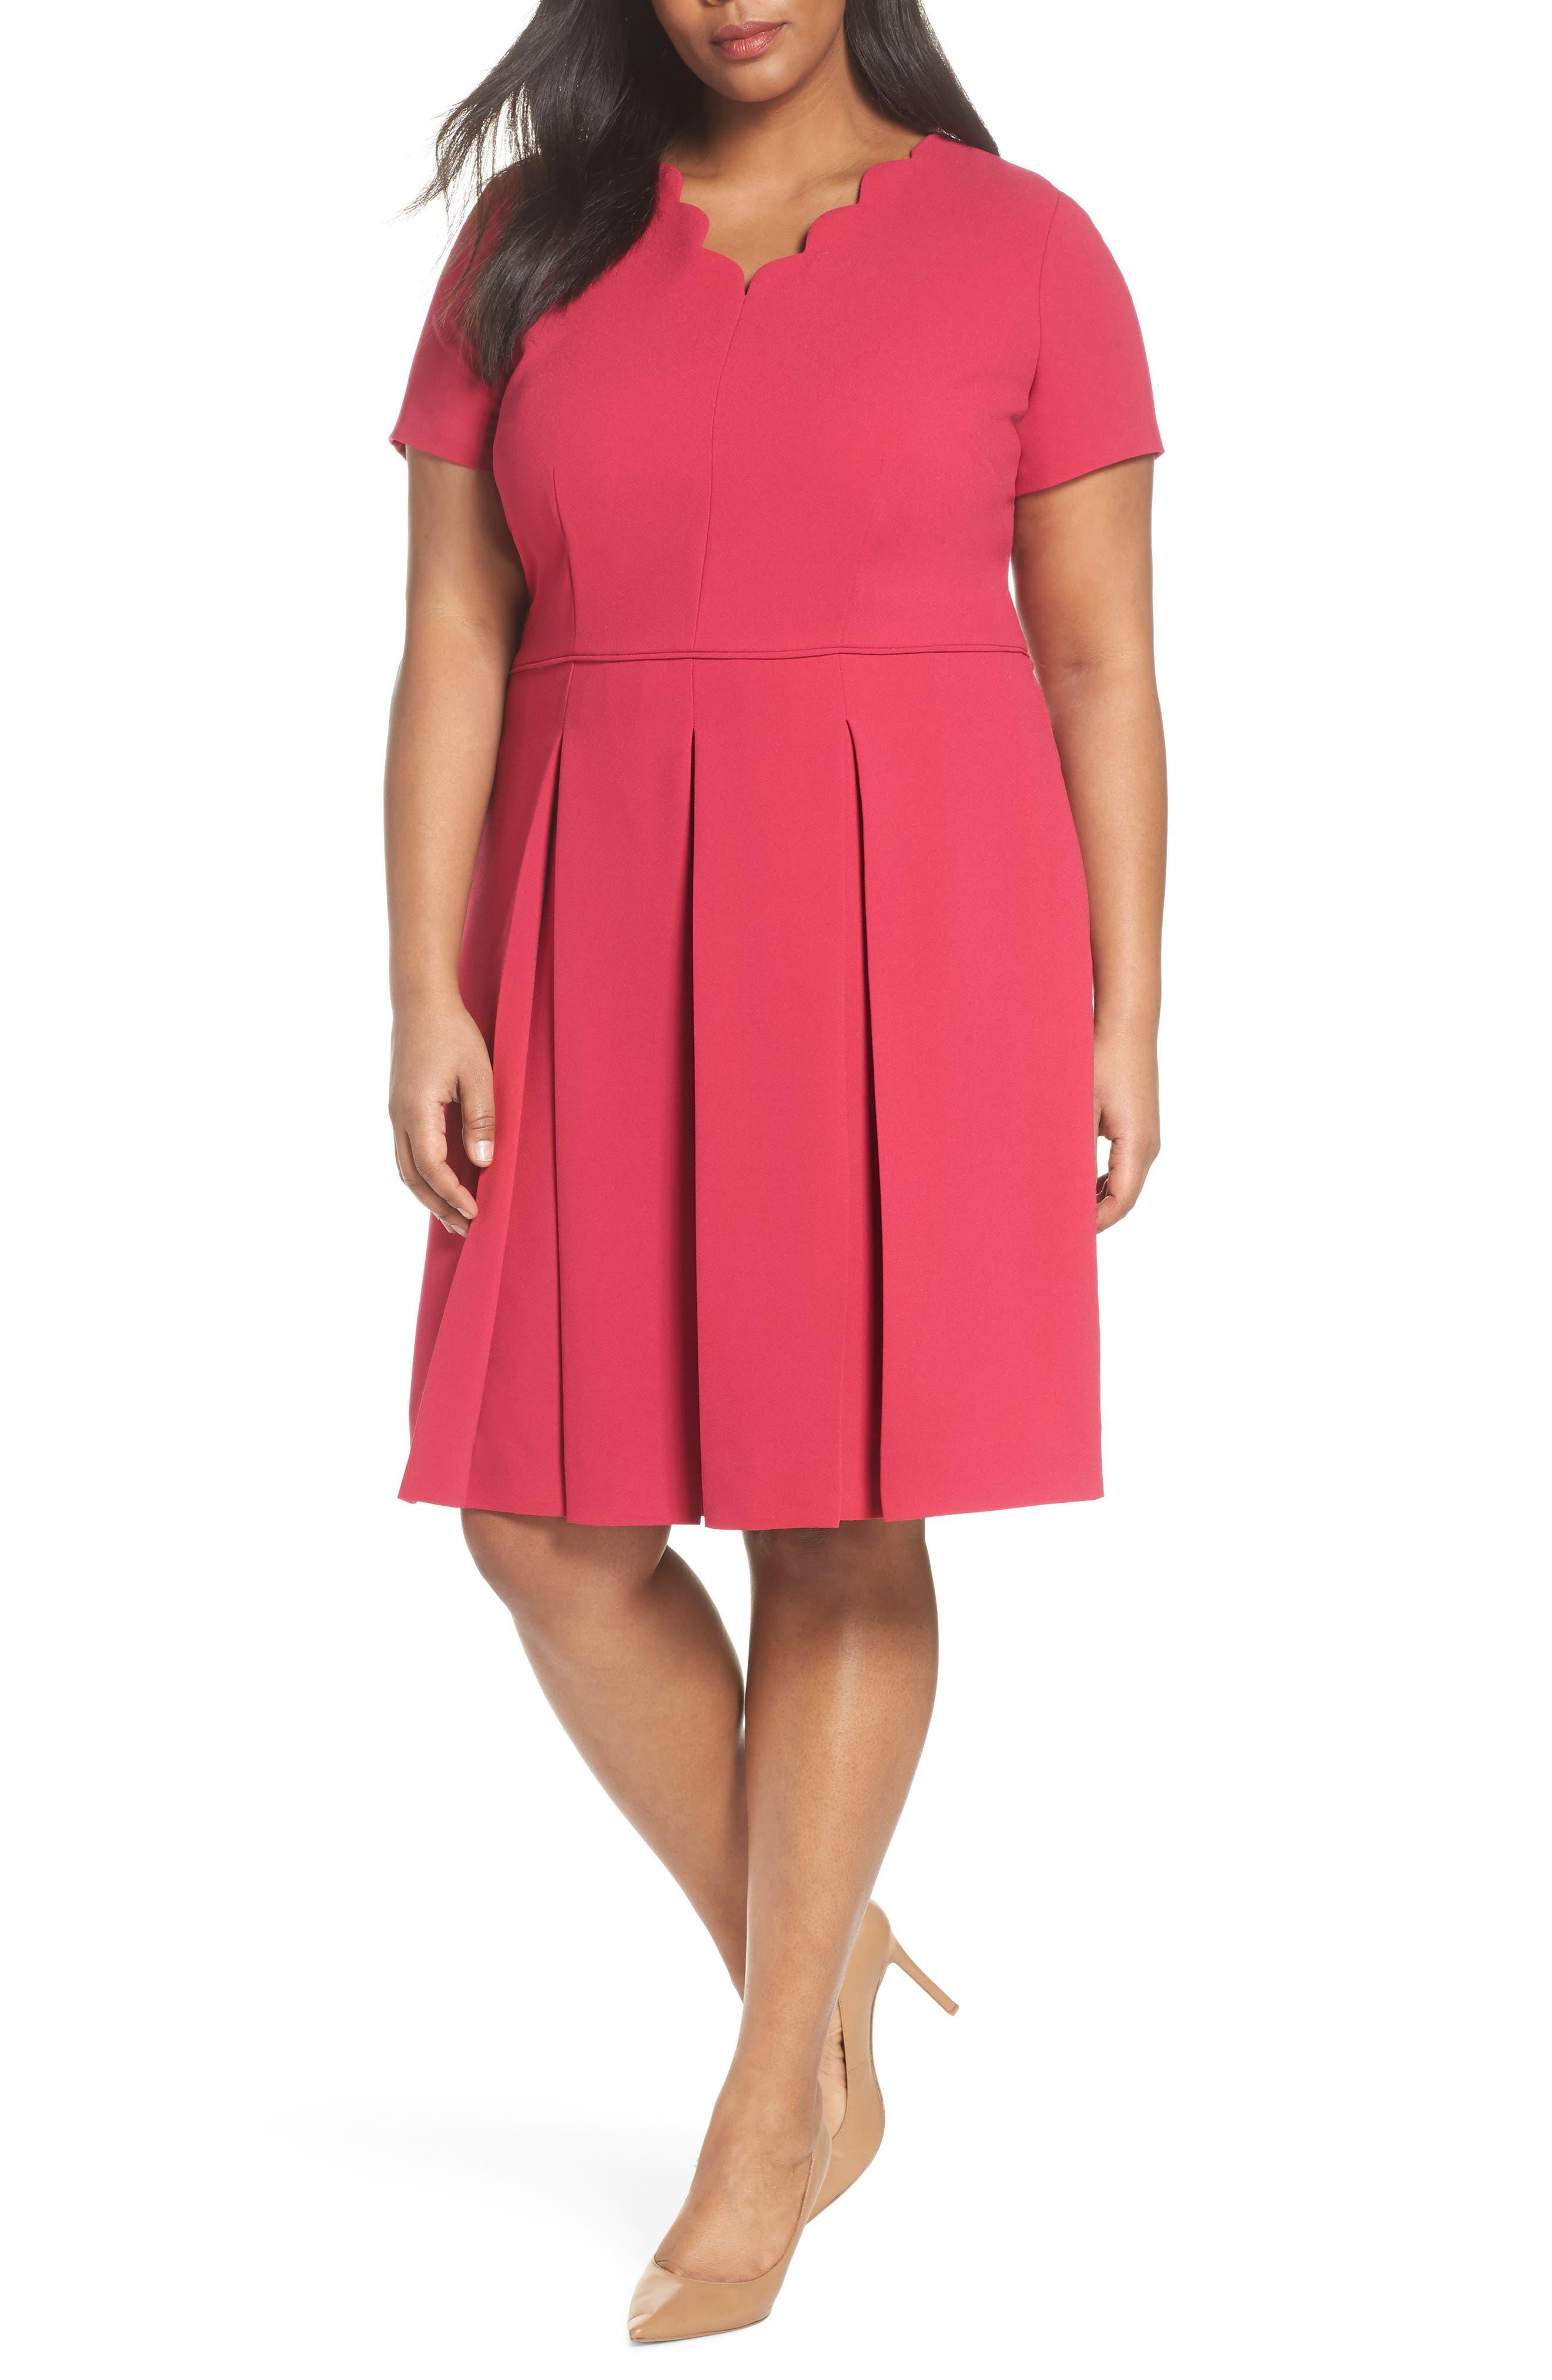 Alternate Image 1 Selected - Tahari Scallop Neck A-Line Dress (Plus Size)